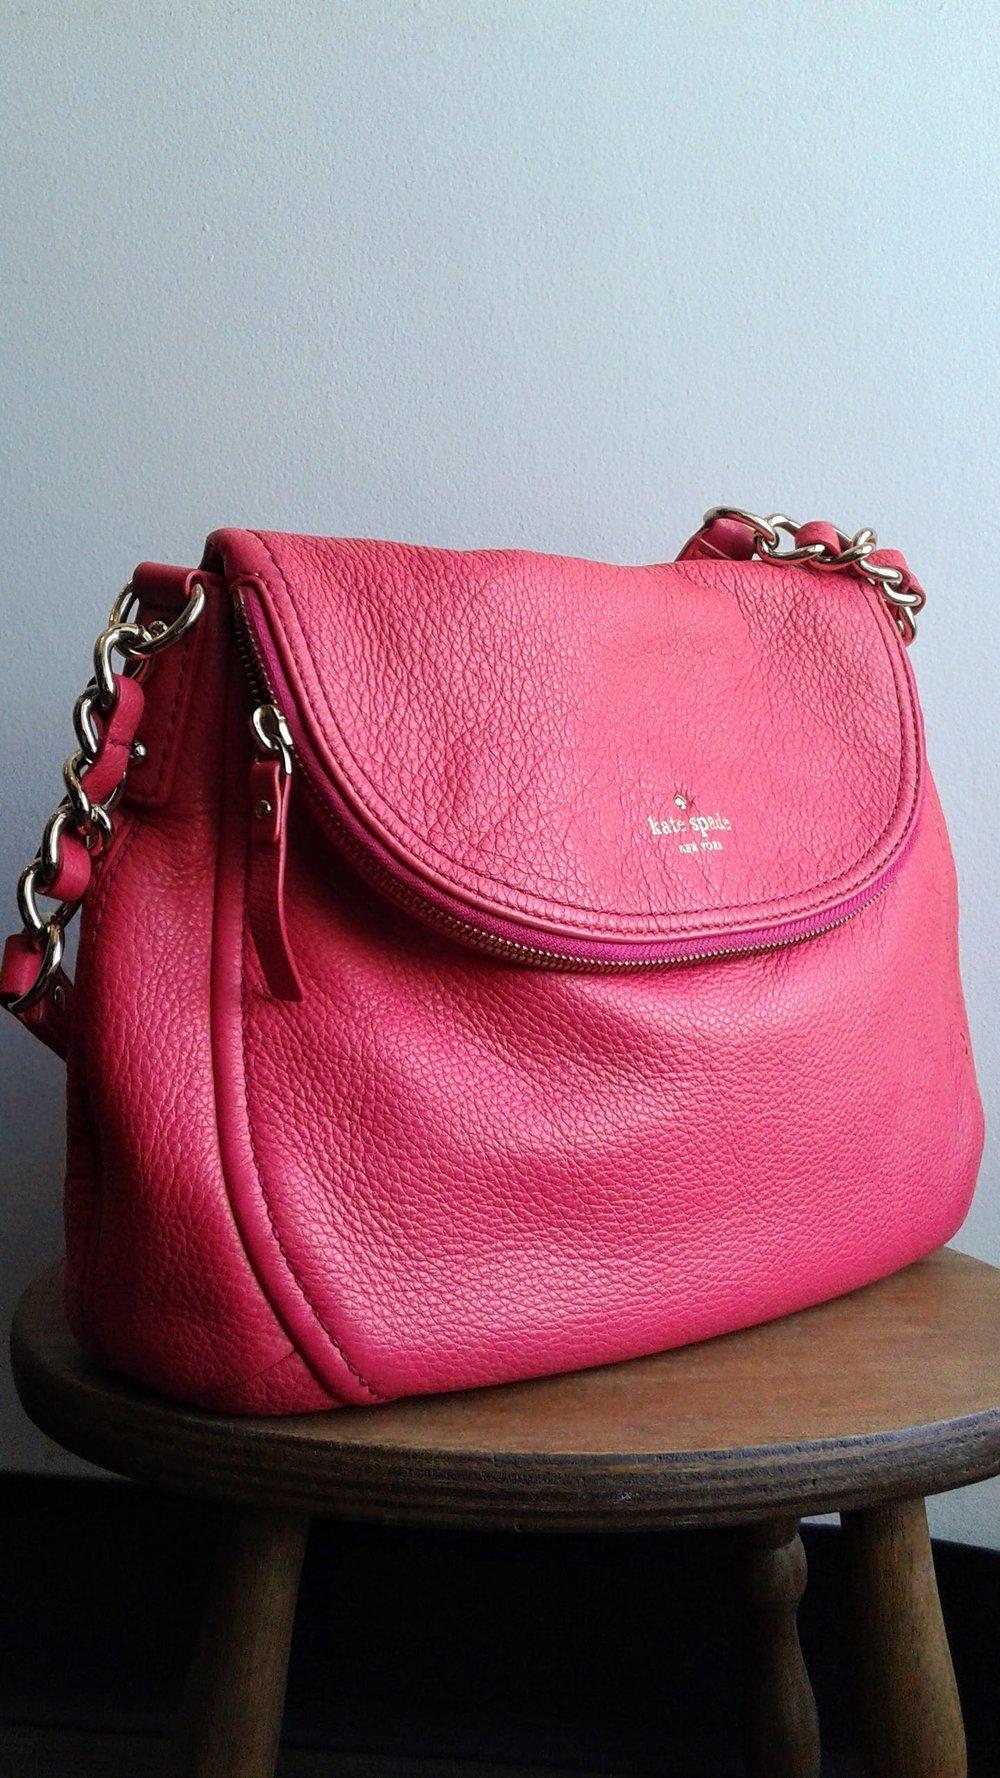 Kate Spade purse, $75